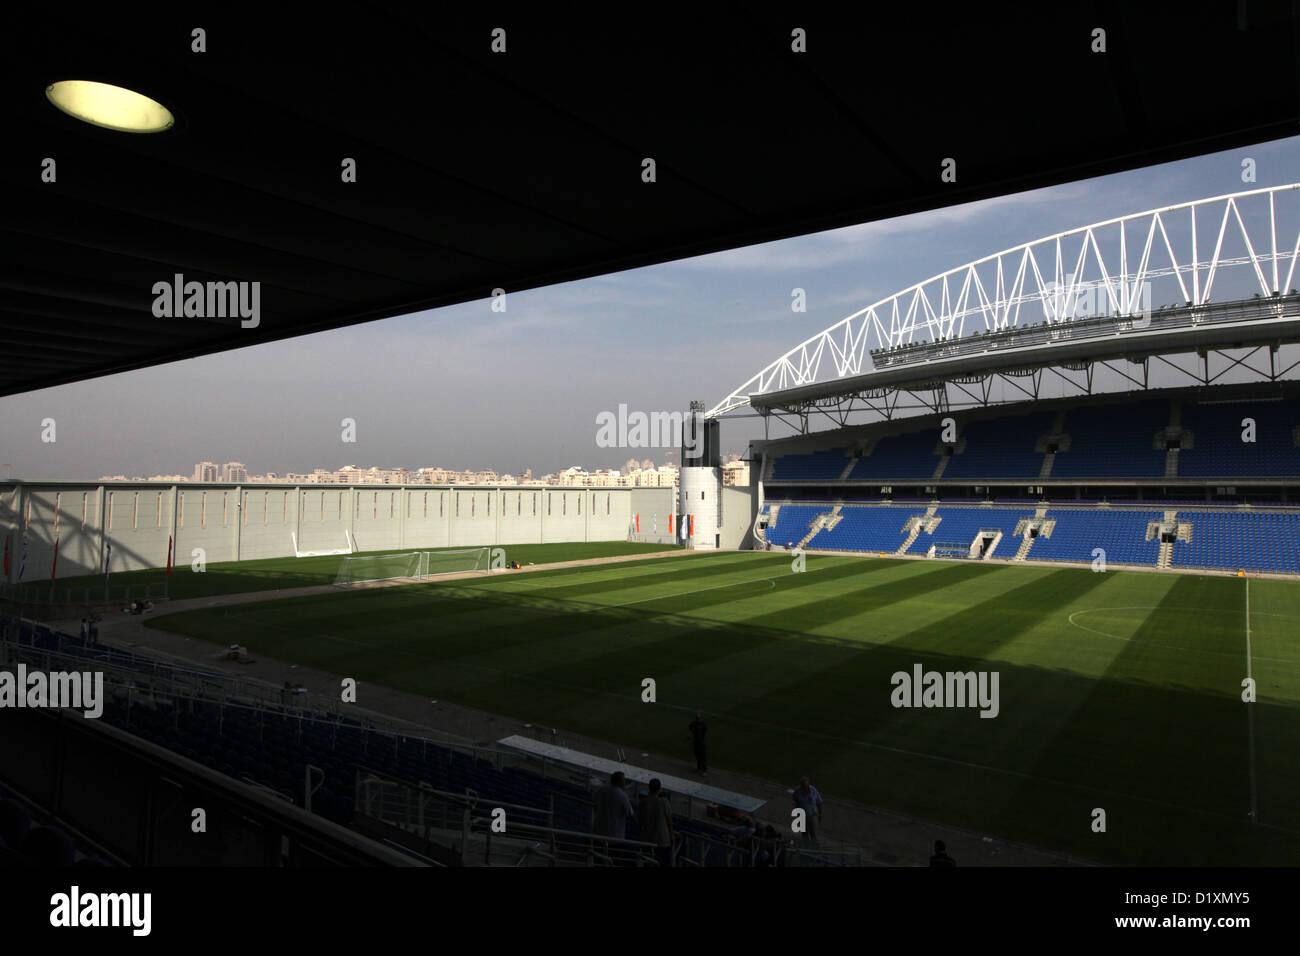 The New Netanya, Israel soccer stadium Stock Photo: 52832953